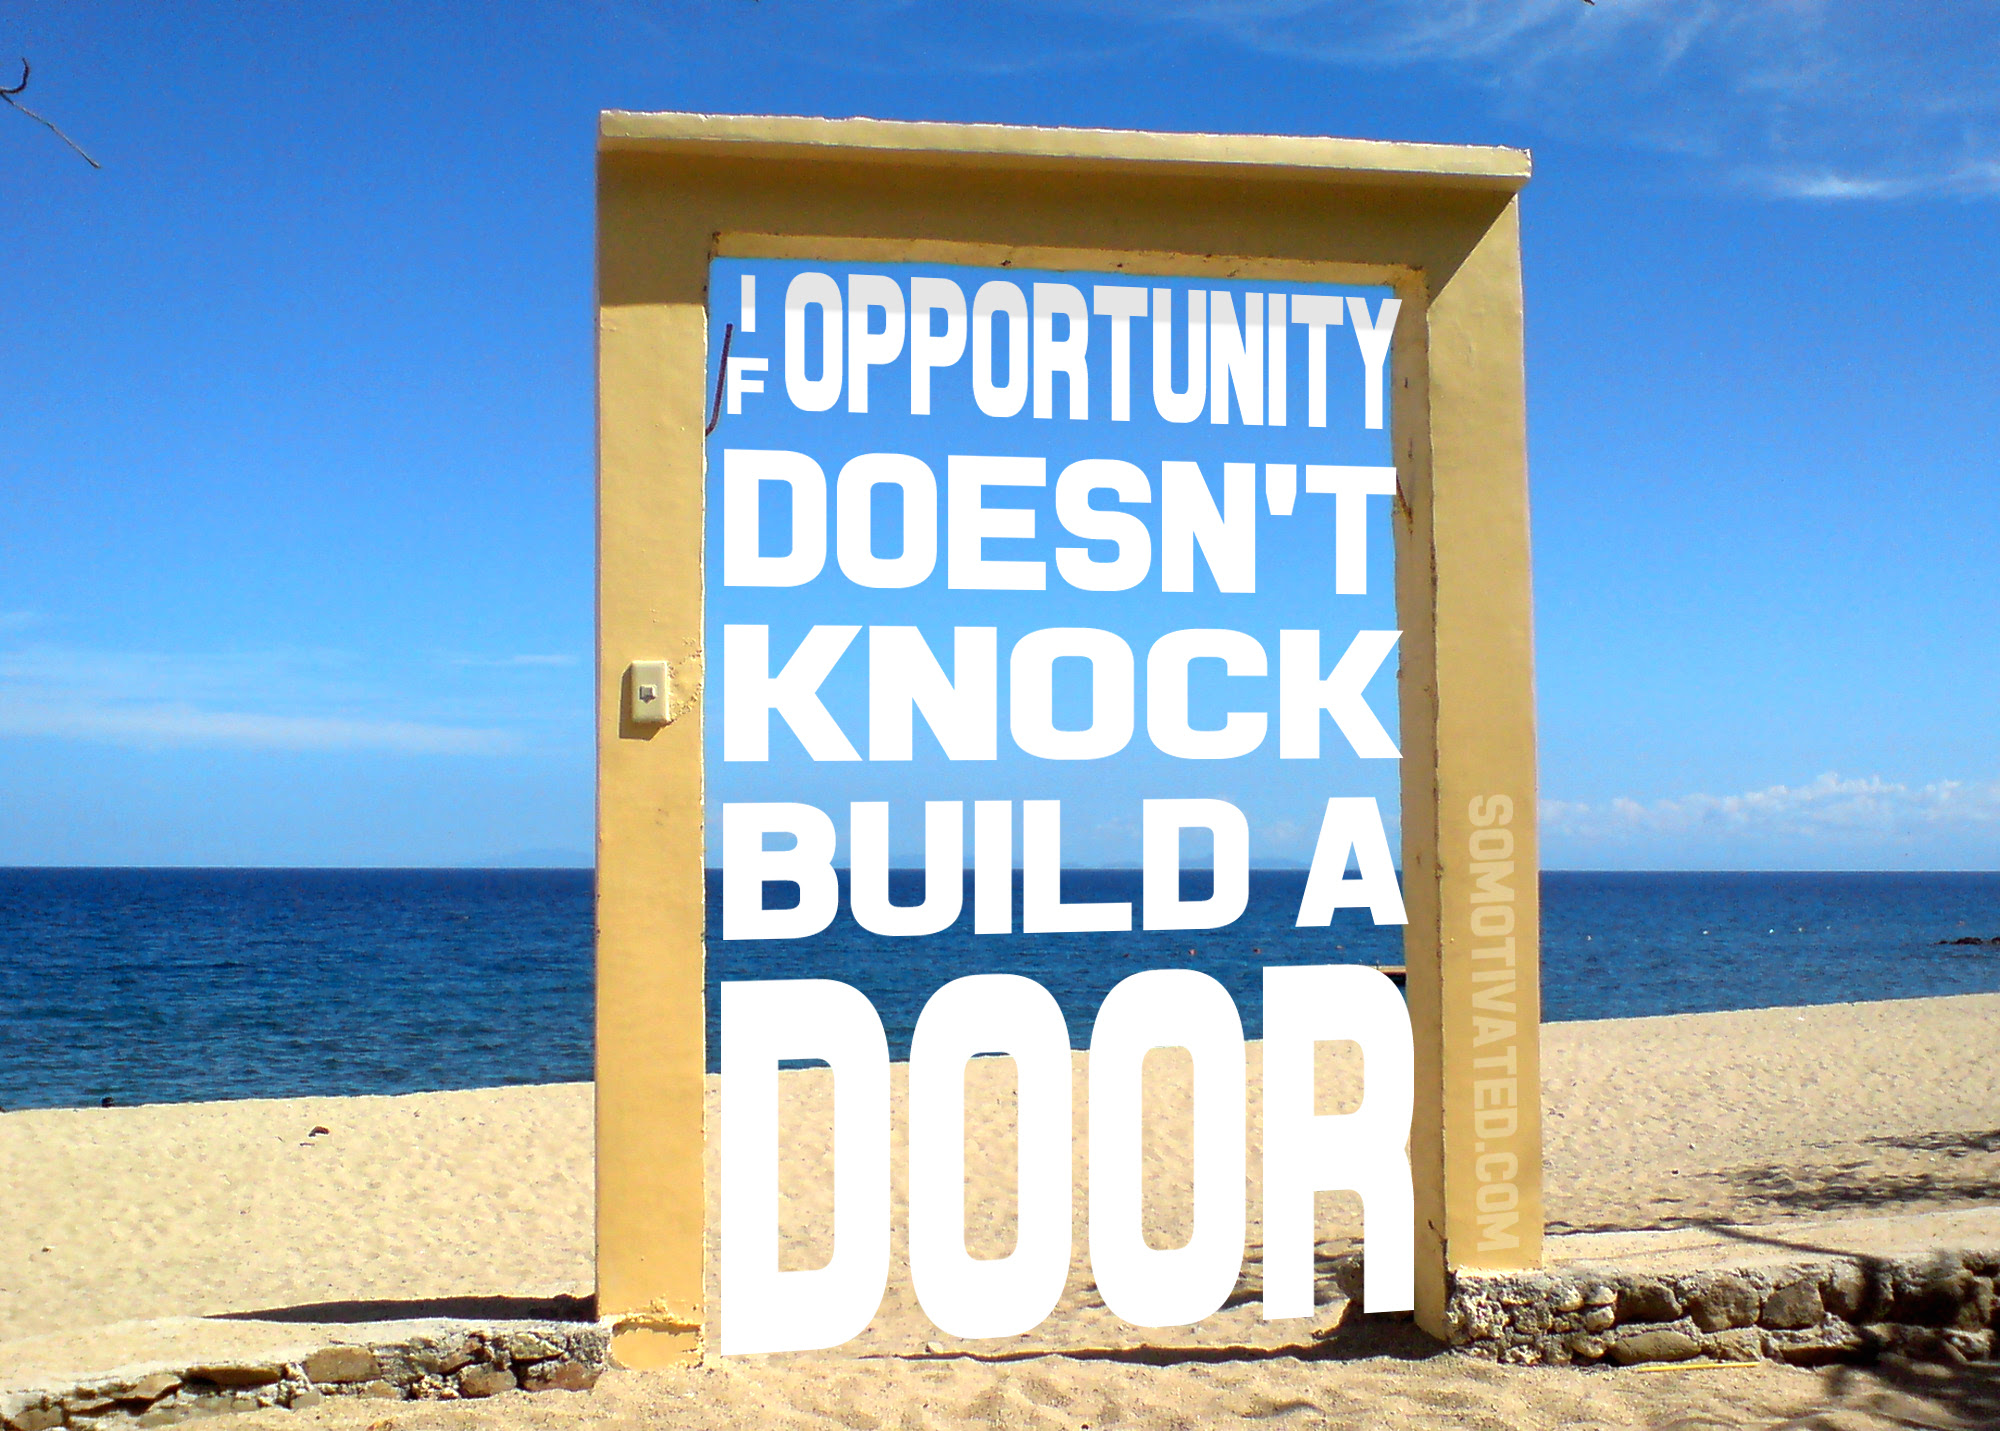 Build A Door So Motivated